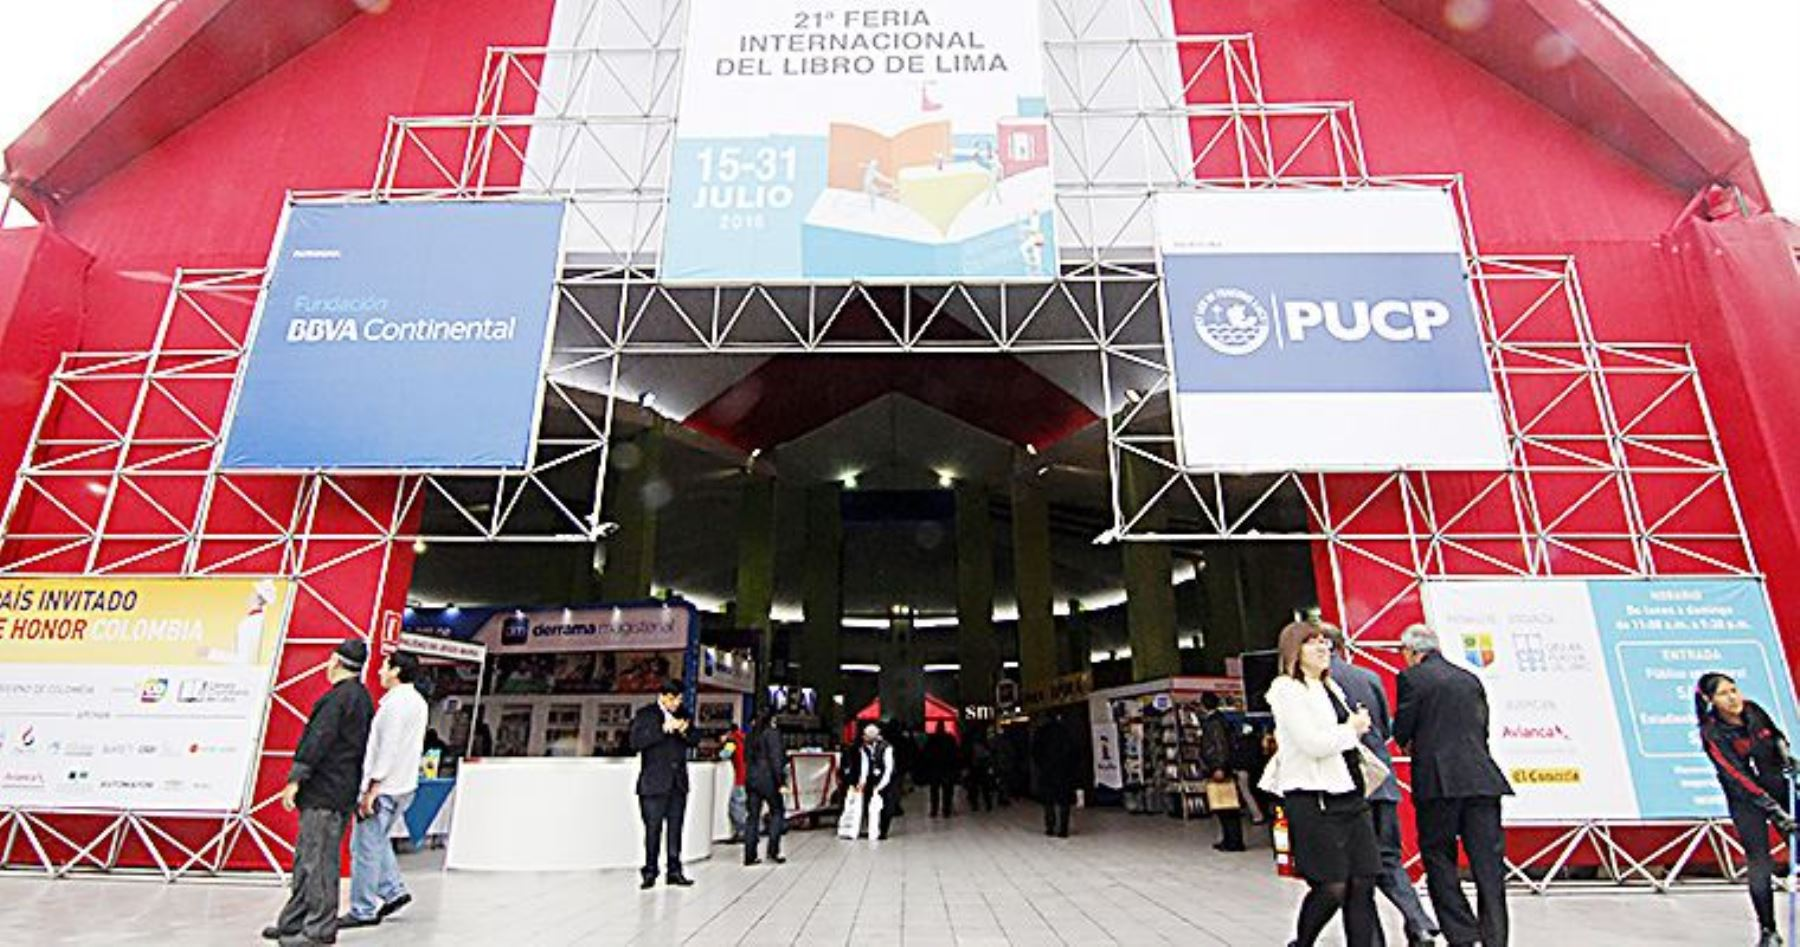 Feria del Libro de Lima